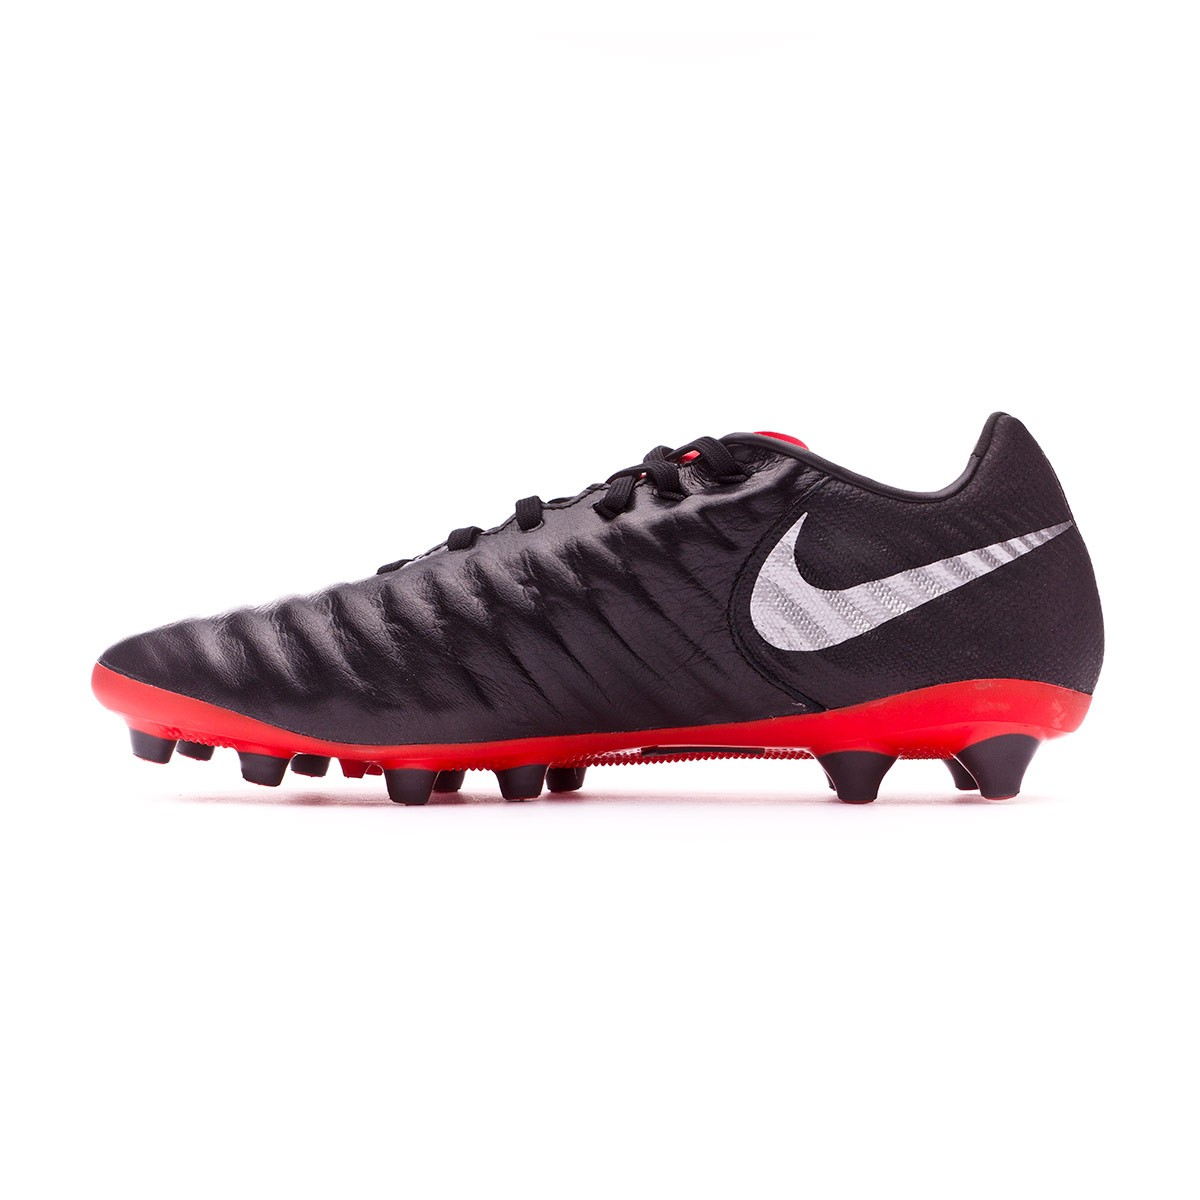 ... Bota Tiempo Legend VII Pro AG-Pro Black-Metallic silver-Light crimson.  CATEGORY. Football boots · Nike football boots 06e75ac51d07d